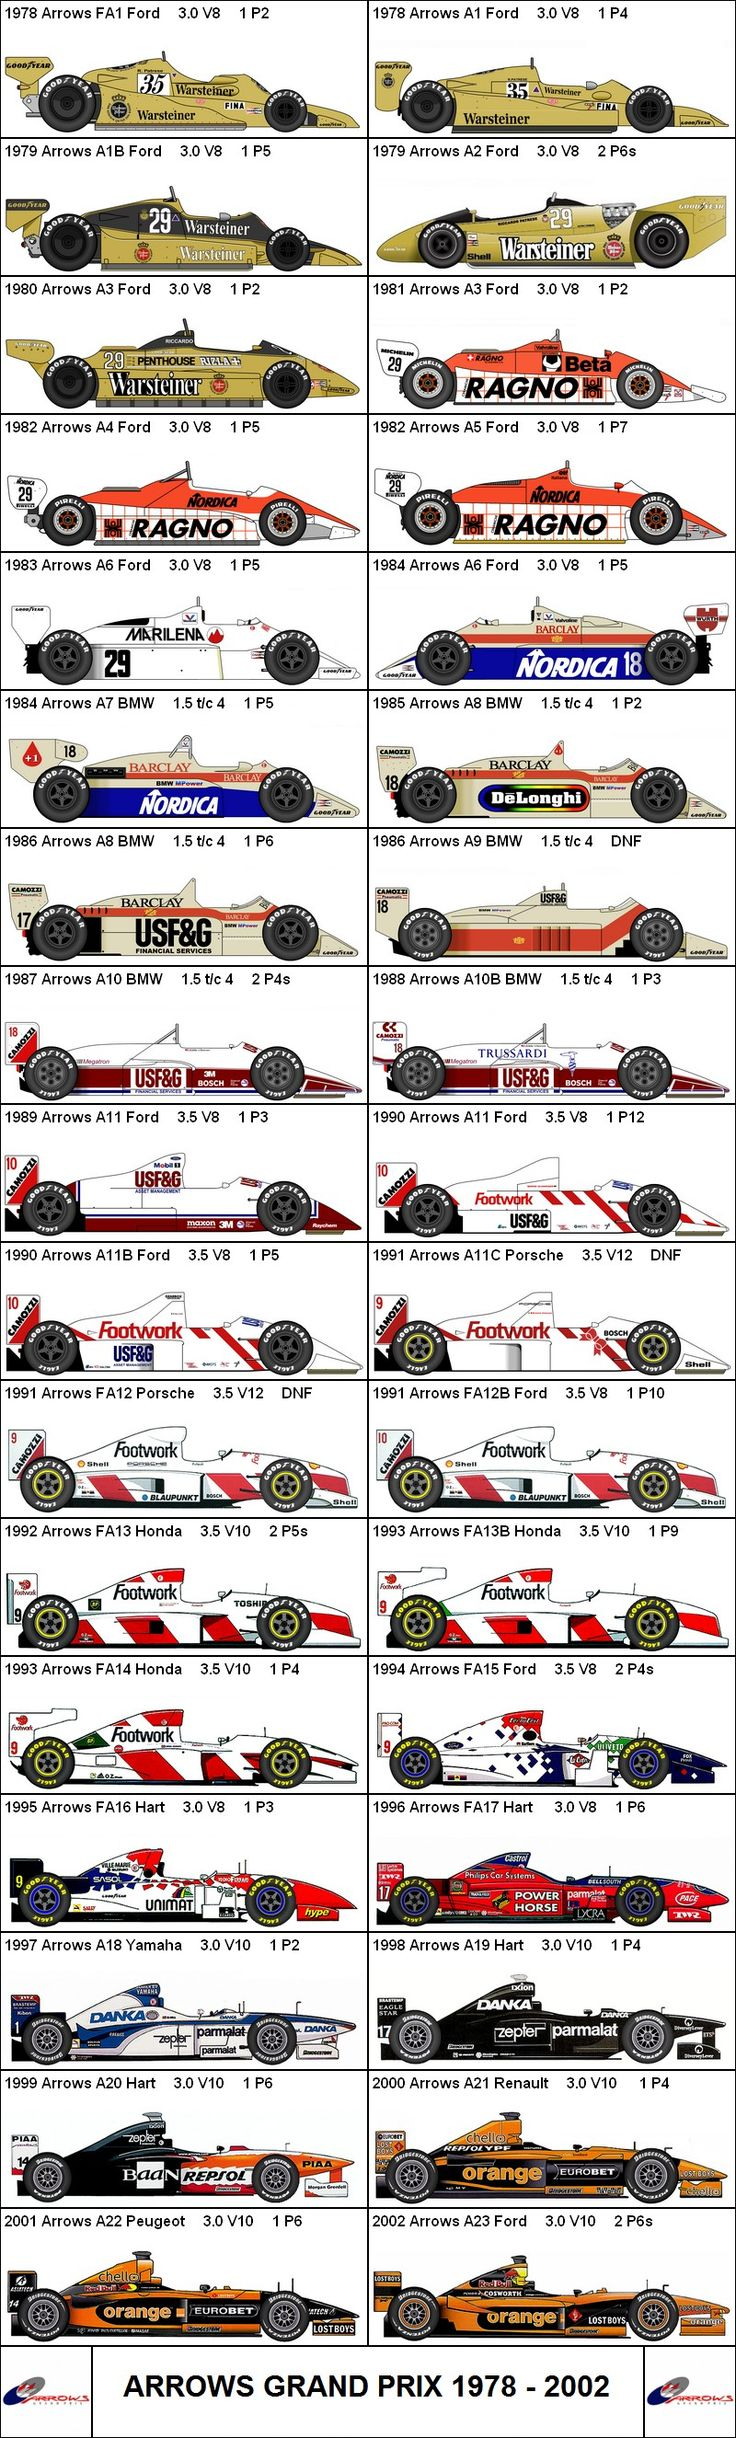 Formula One Grand Prix Arrows 1978-2002